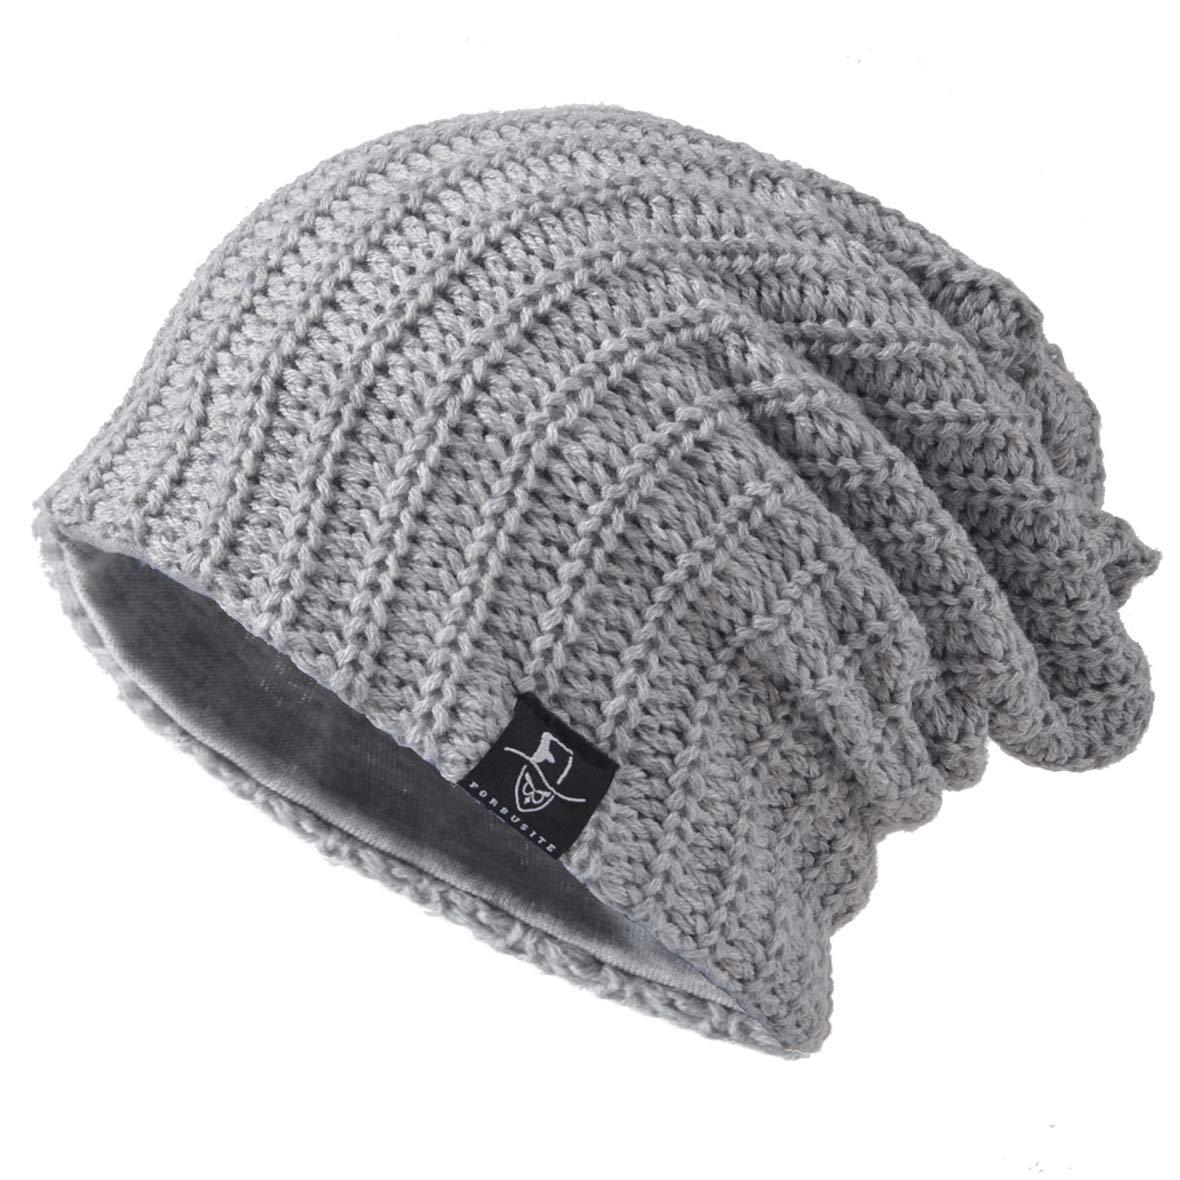 Oversized Baggy Skull Cap Winter Warm Ski Hat B305 Ruphedy Mens Slouch Knit Beanie